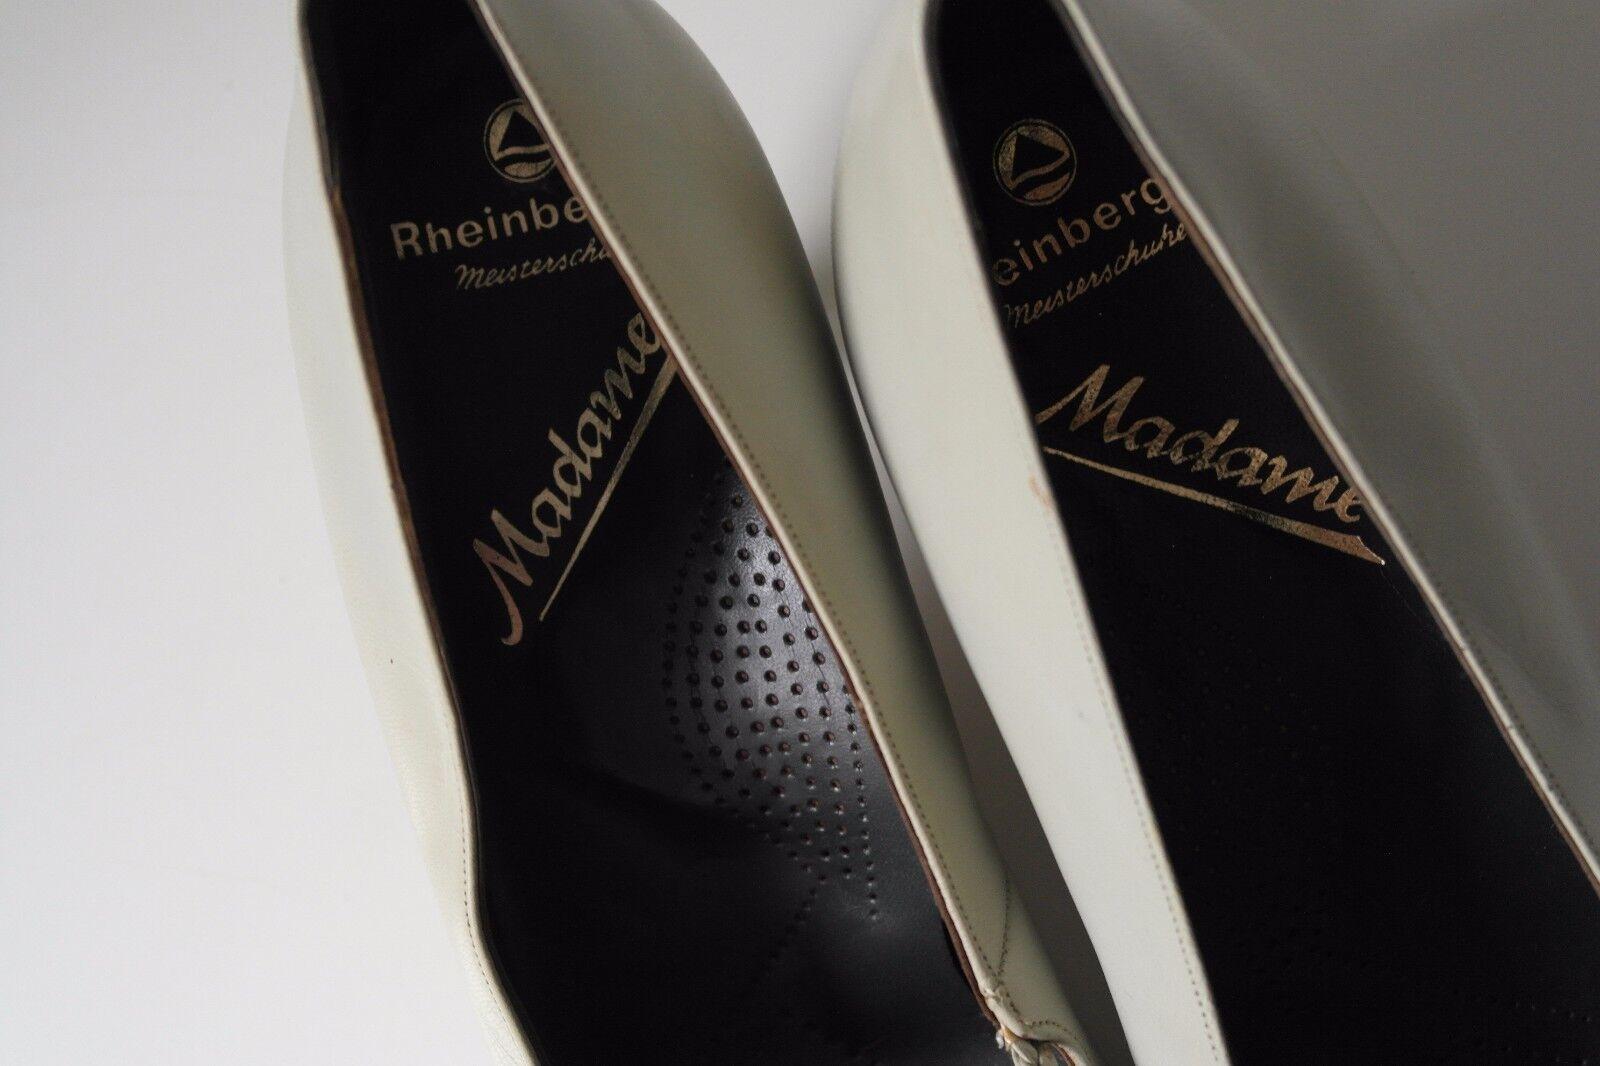 Rheinberger Meisterschuhe Hilta Damen Pumps Schuhe TRUE VINTAGE 7 Halbschuhe UK 7 VINTAGE a46f0b